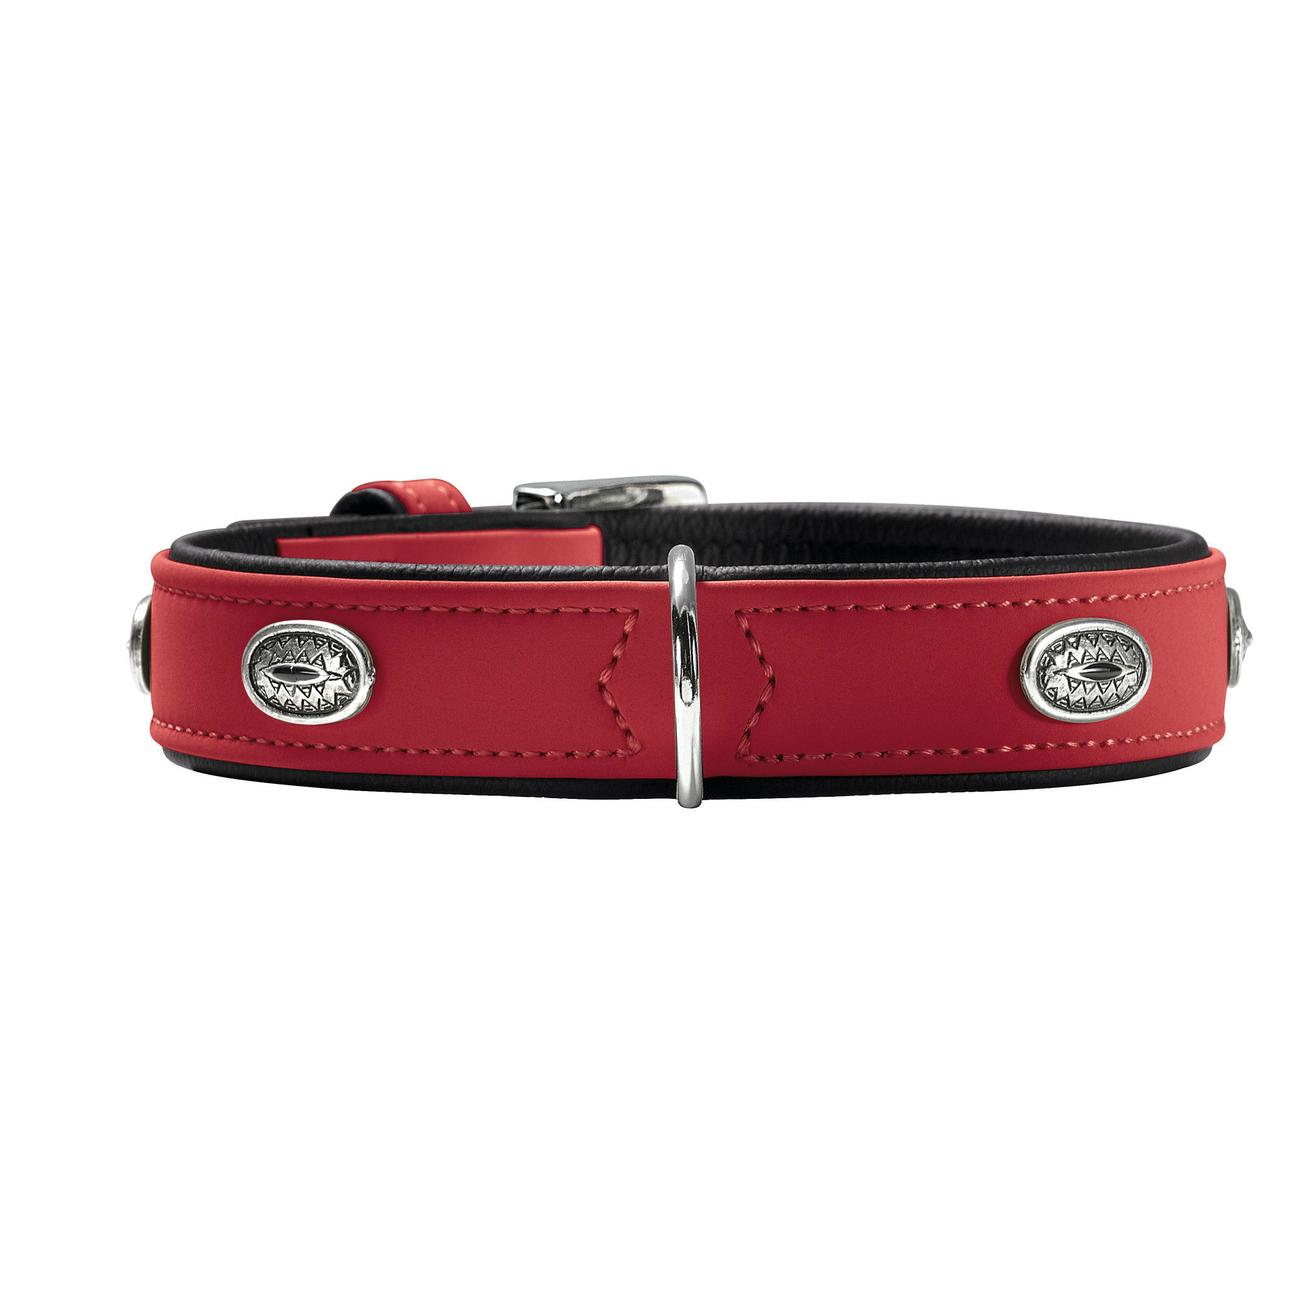 Hunter Hundehalsband Softie Stone 47568, Bild 3